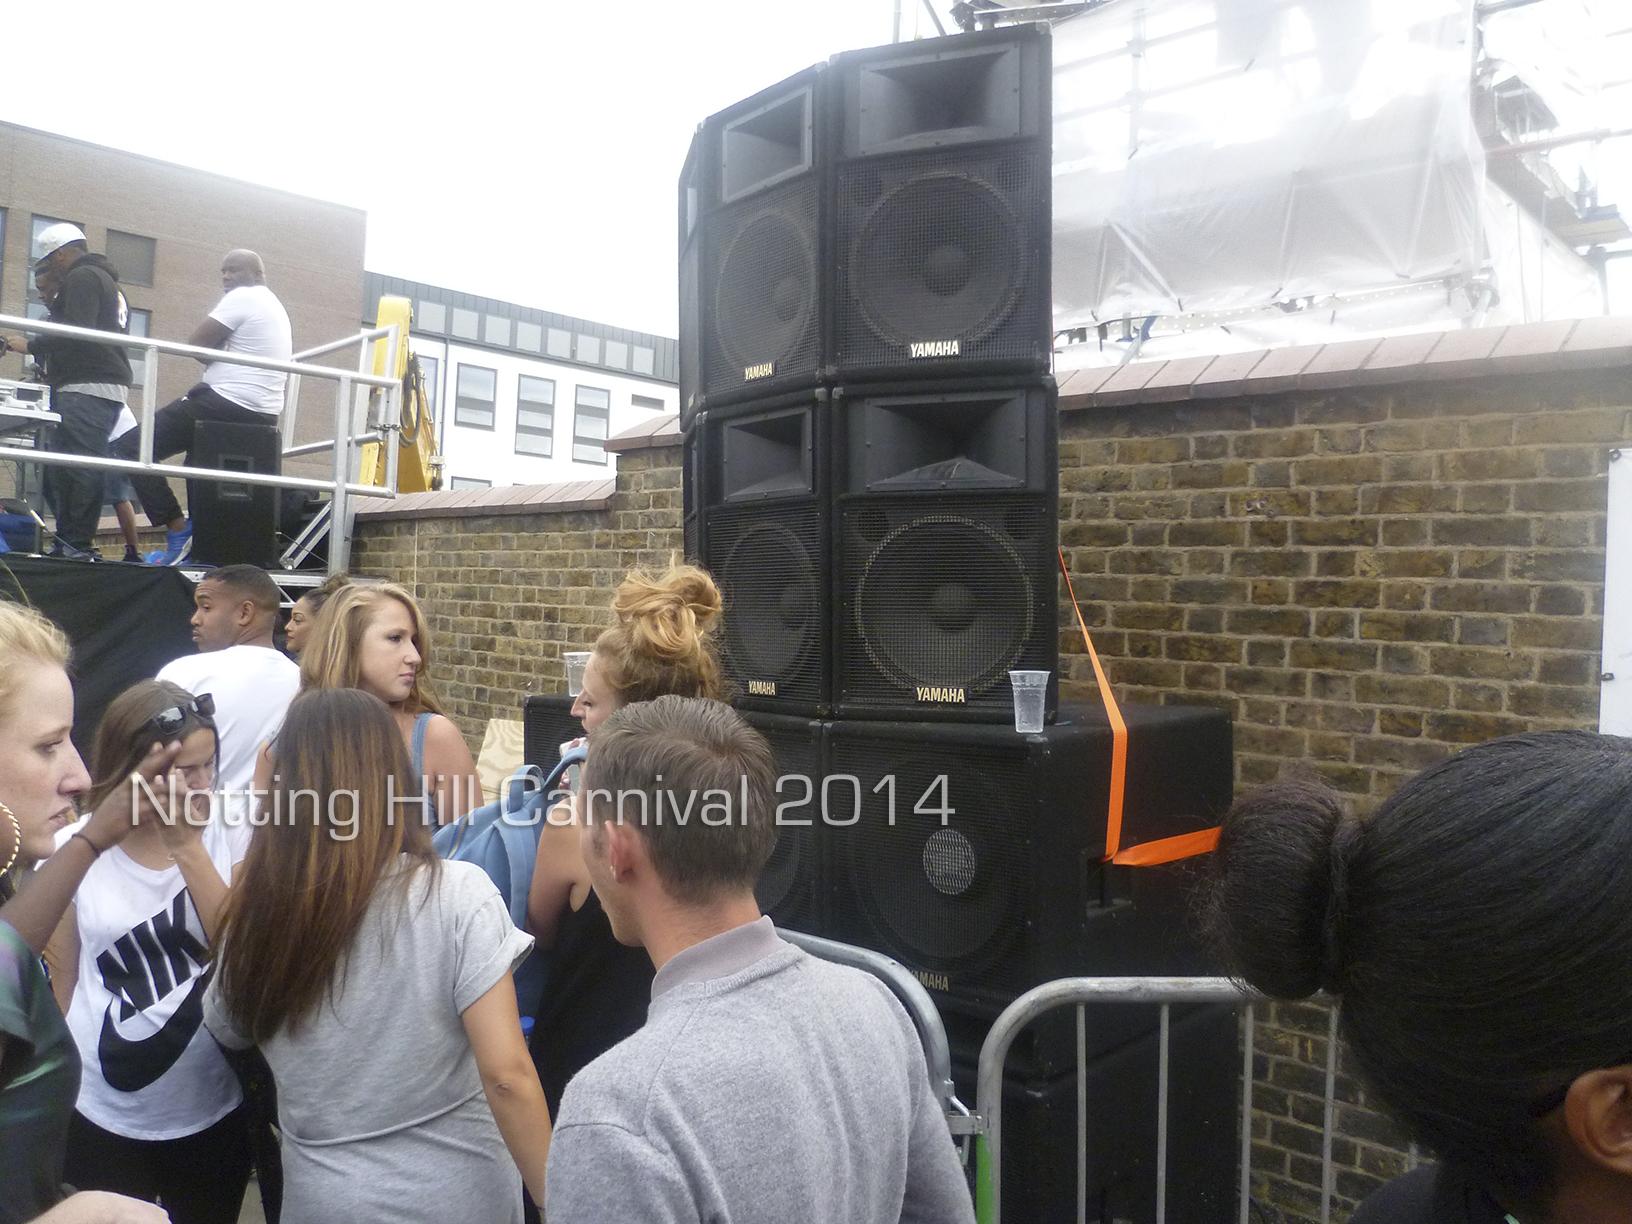 Notting-Hill-Carnival-2014-Street-Sound-System-22